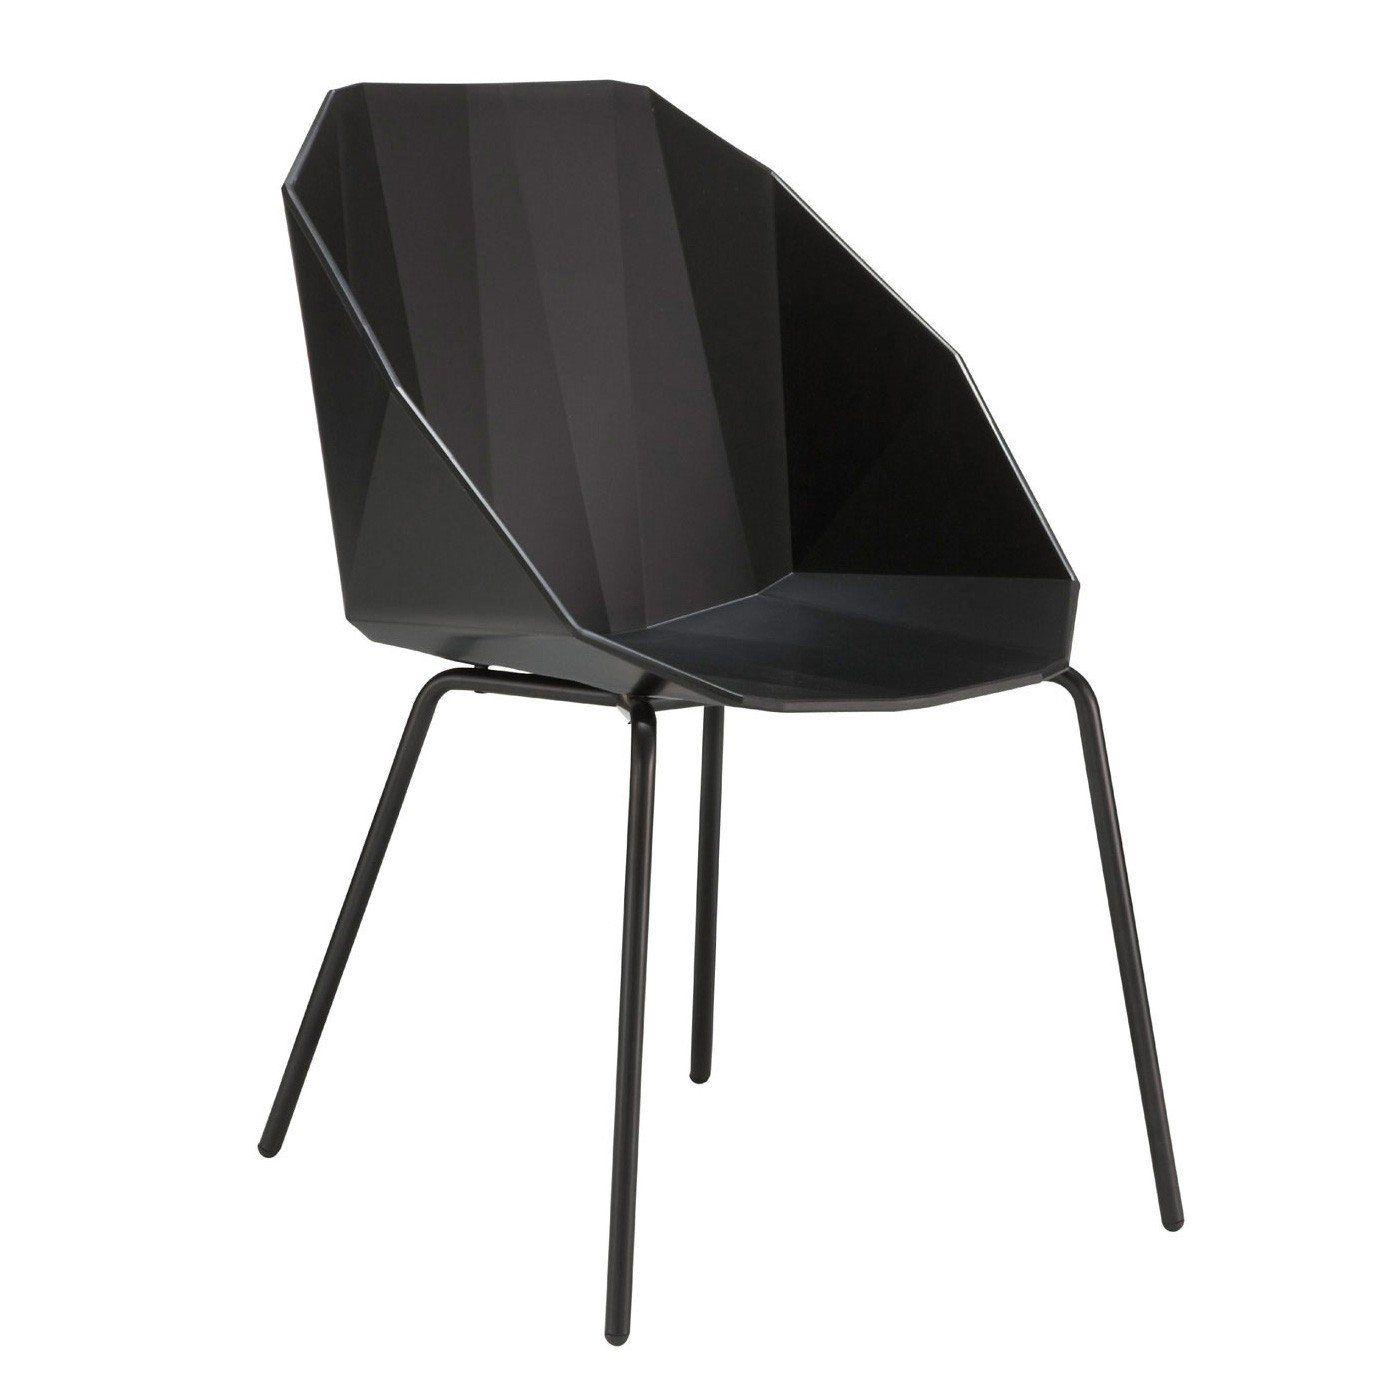 Rocher Dining Chair Black Black Legs Luxury Dining Chair Modern